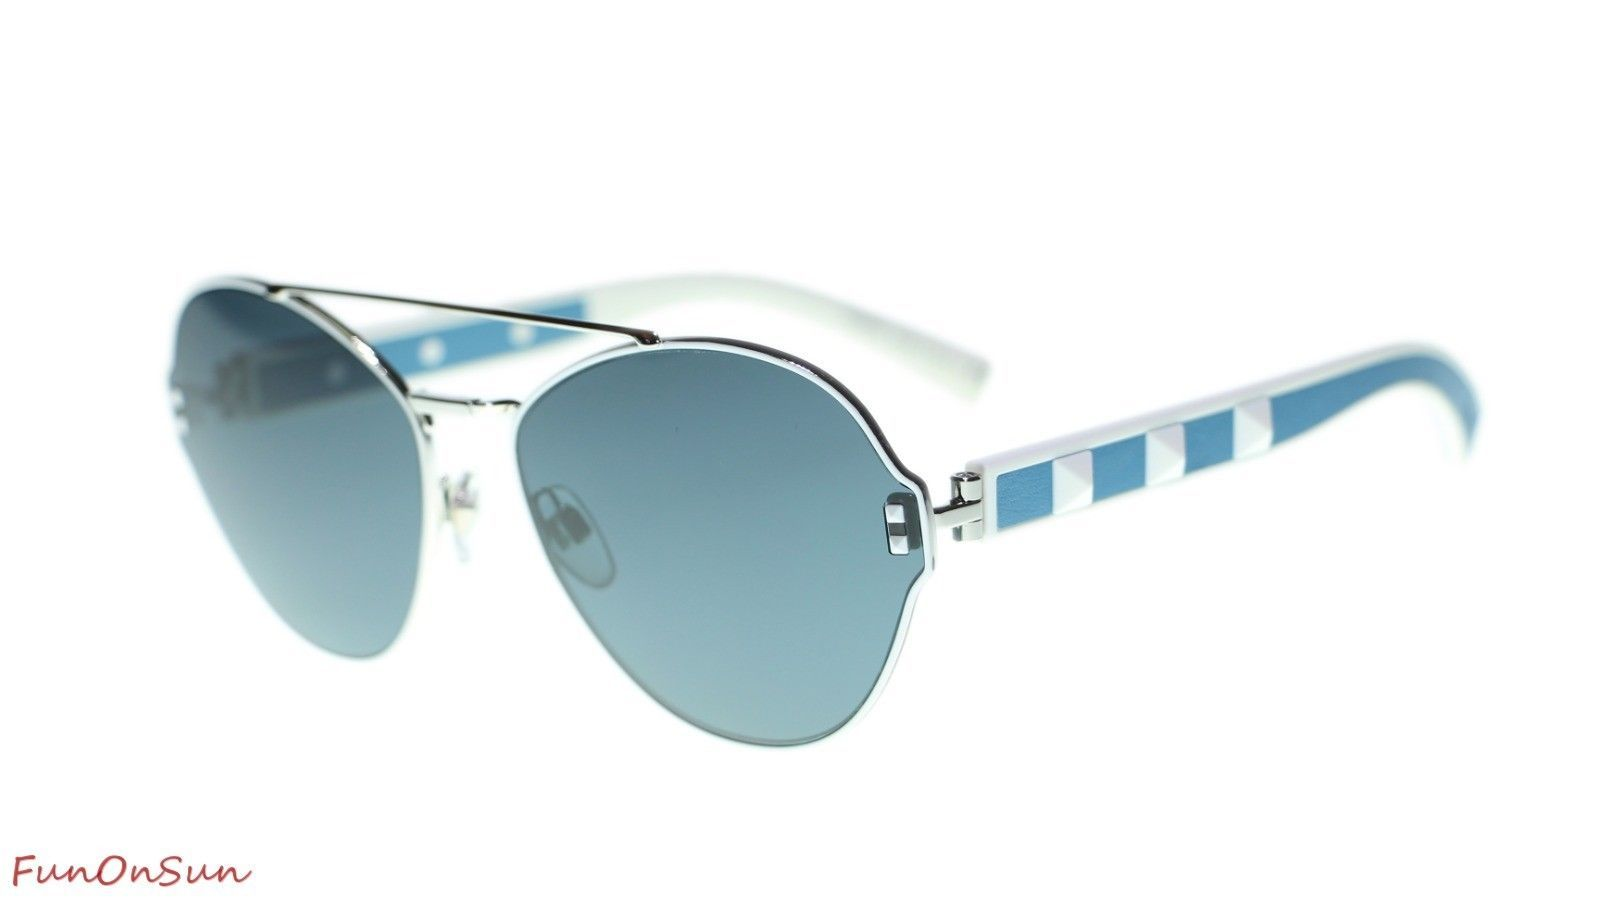 Valentino Sunglasses VA2025 304087 Silver White/Smoke Blue Lens Authentic 60mm